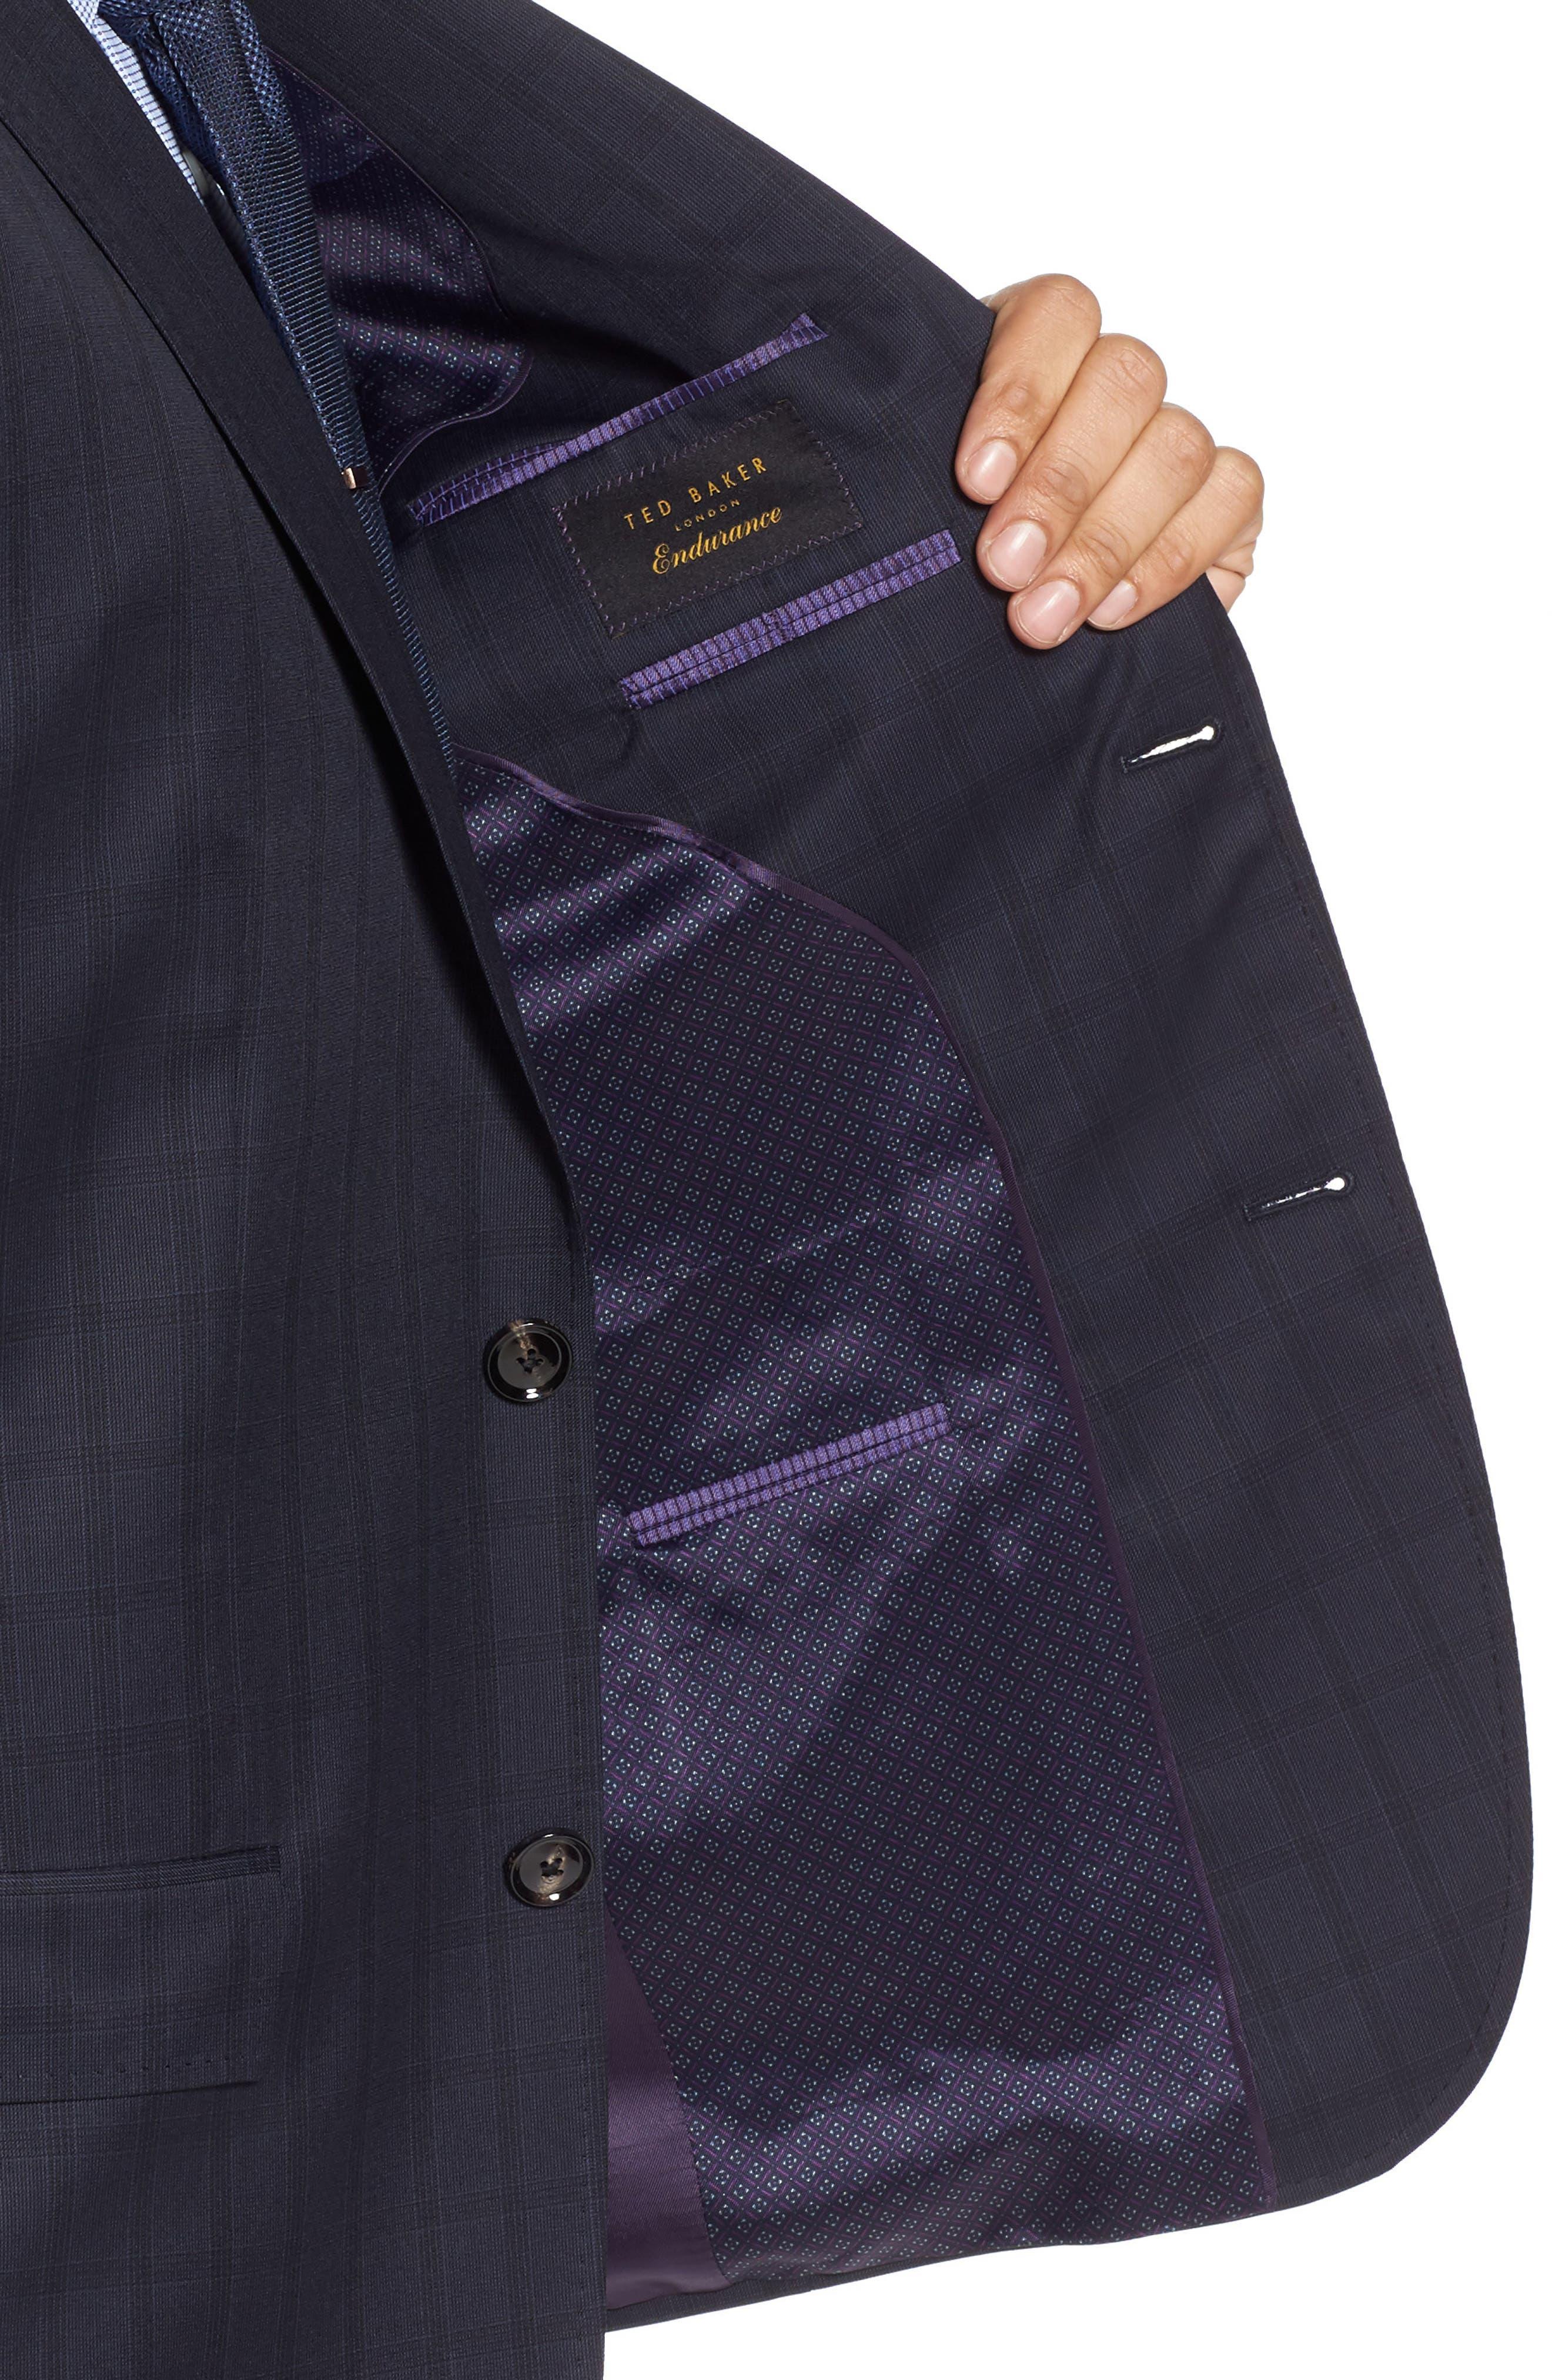 Jay Trim Fit Check Wool Suit,                             Alternate thumbnail 4, color,                             410